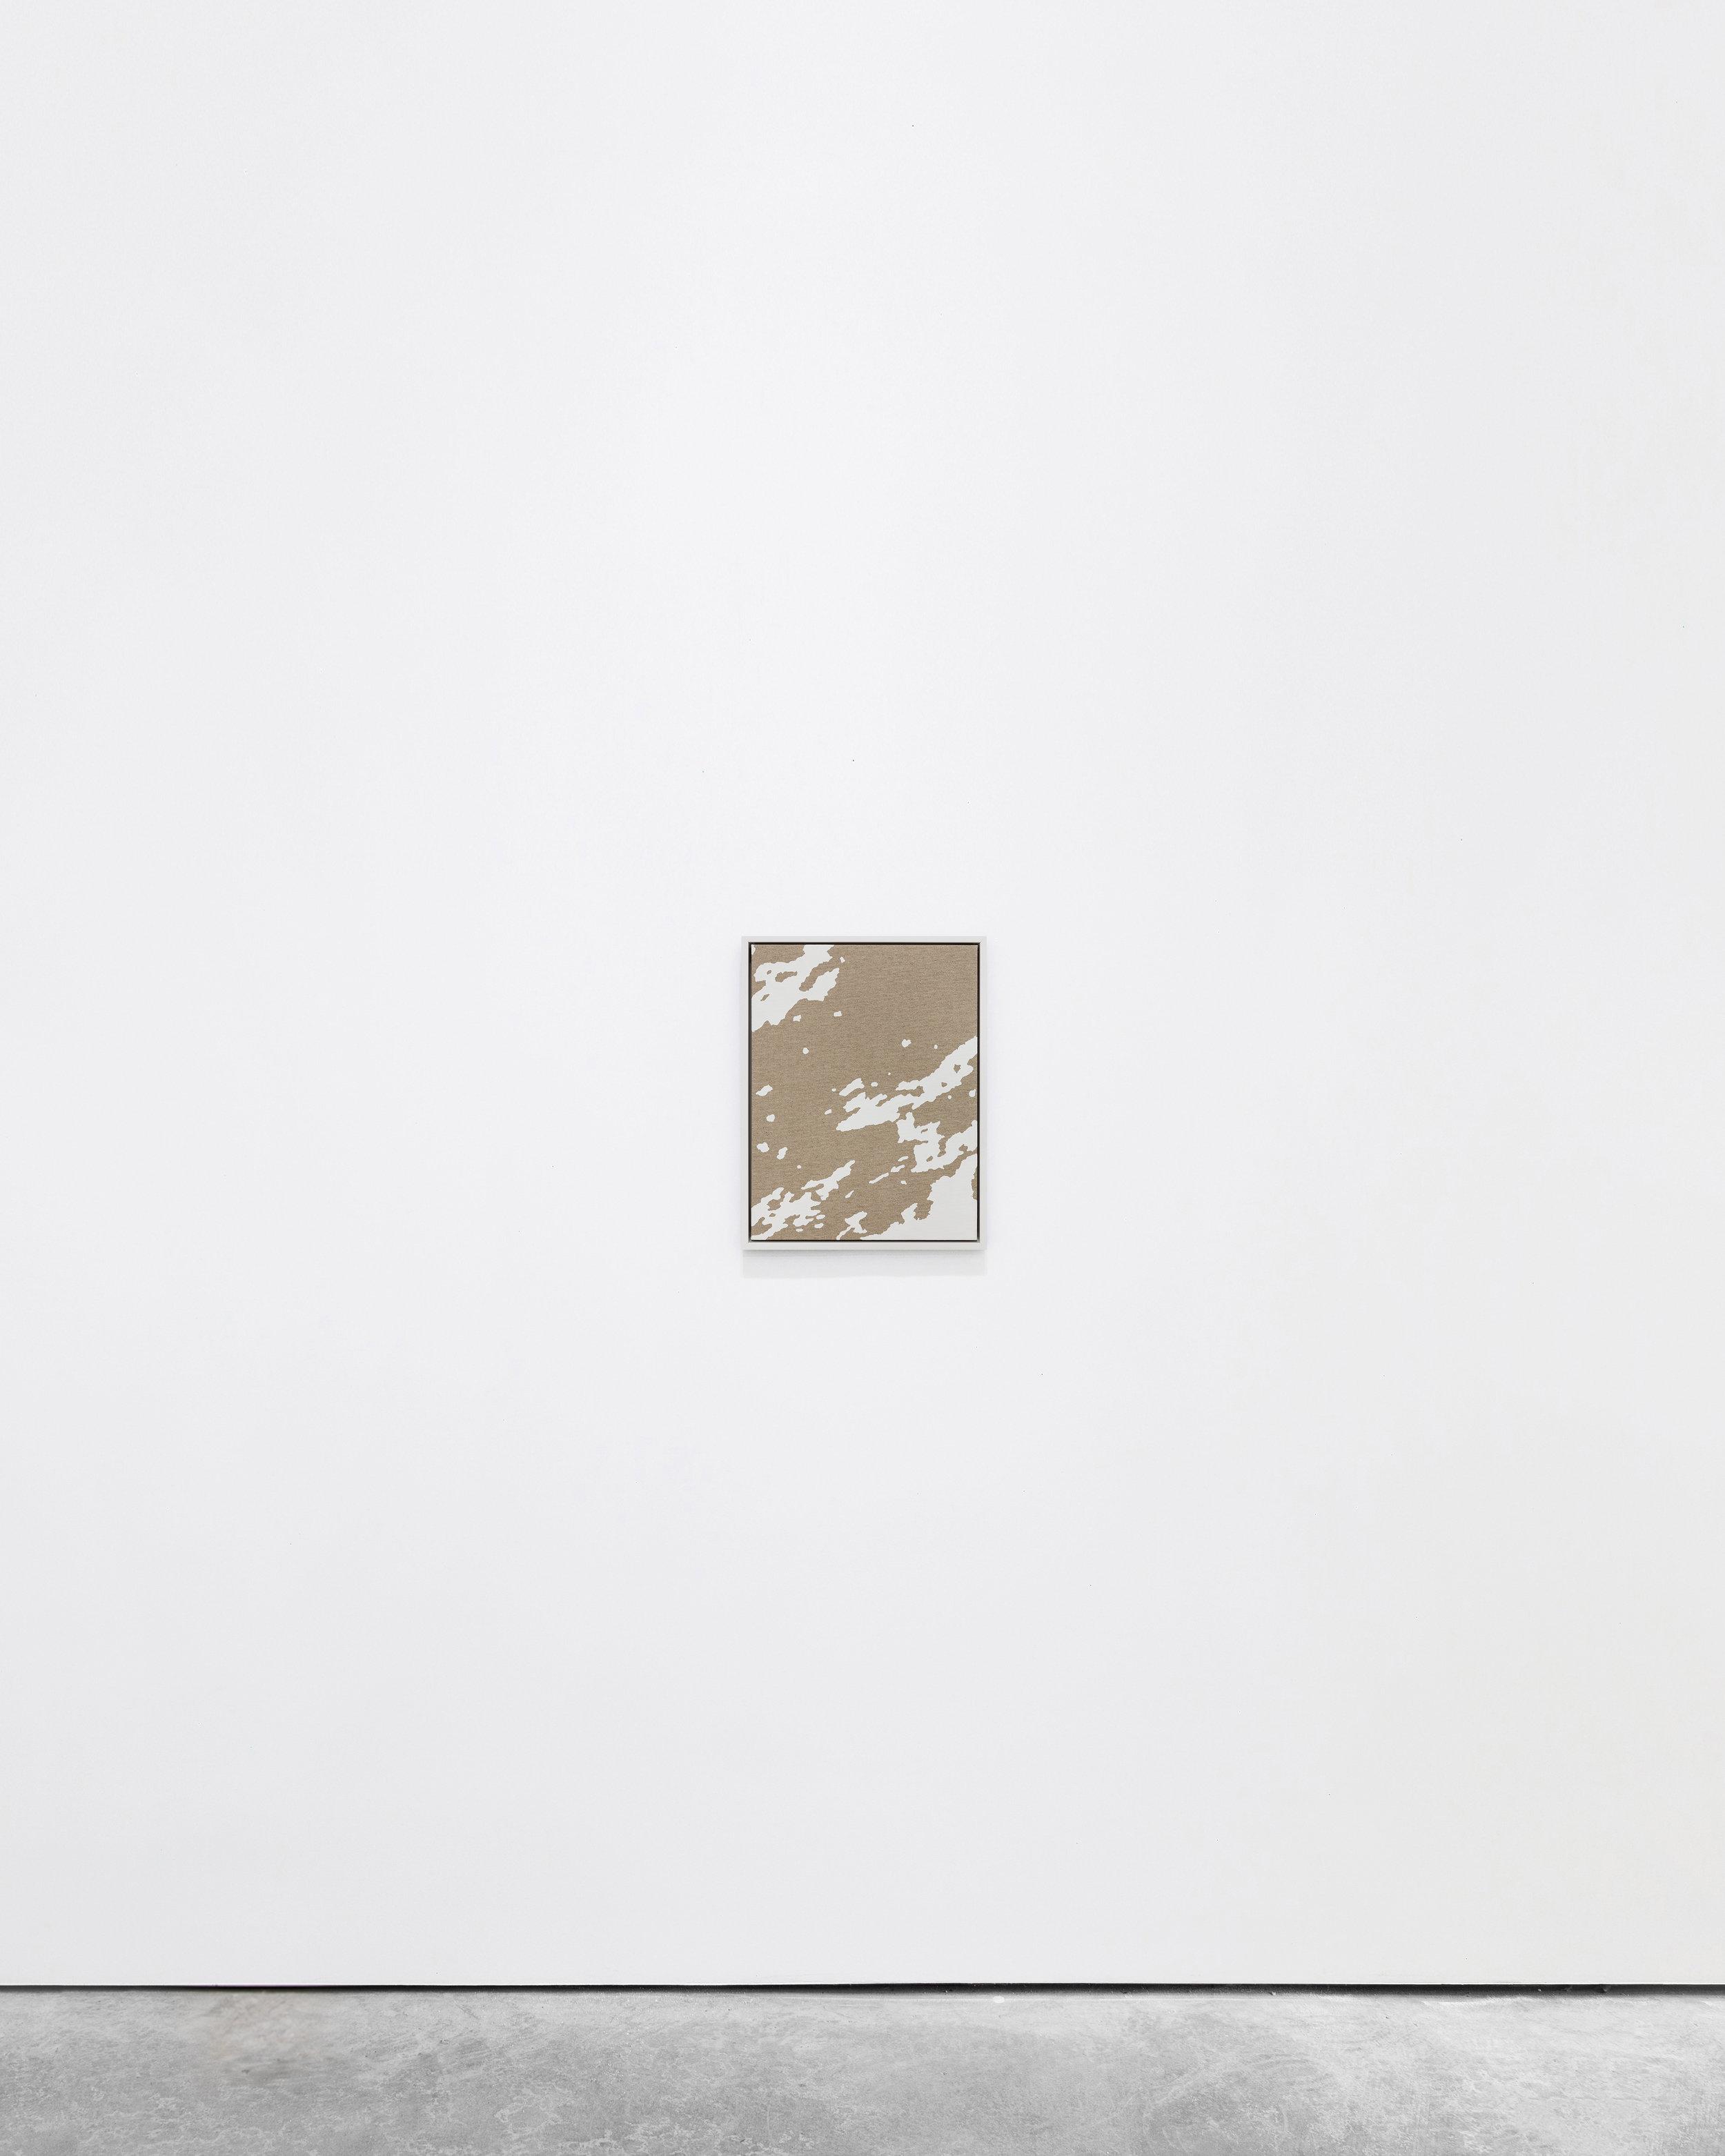 Pedro Matos  never a place, but a new way… , 2016 Acrylic enamel on unprimed linen, wood frame 40 x 30 cm